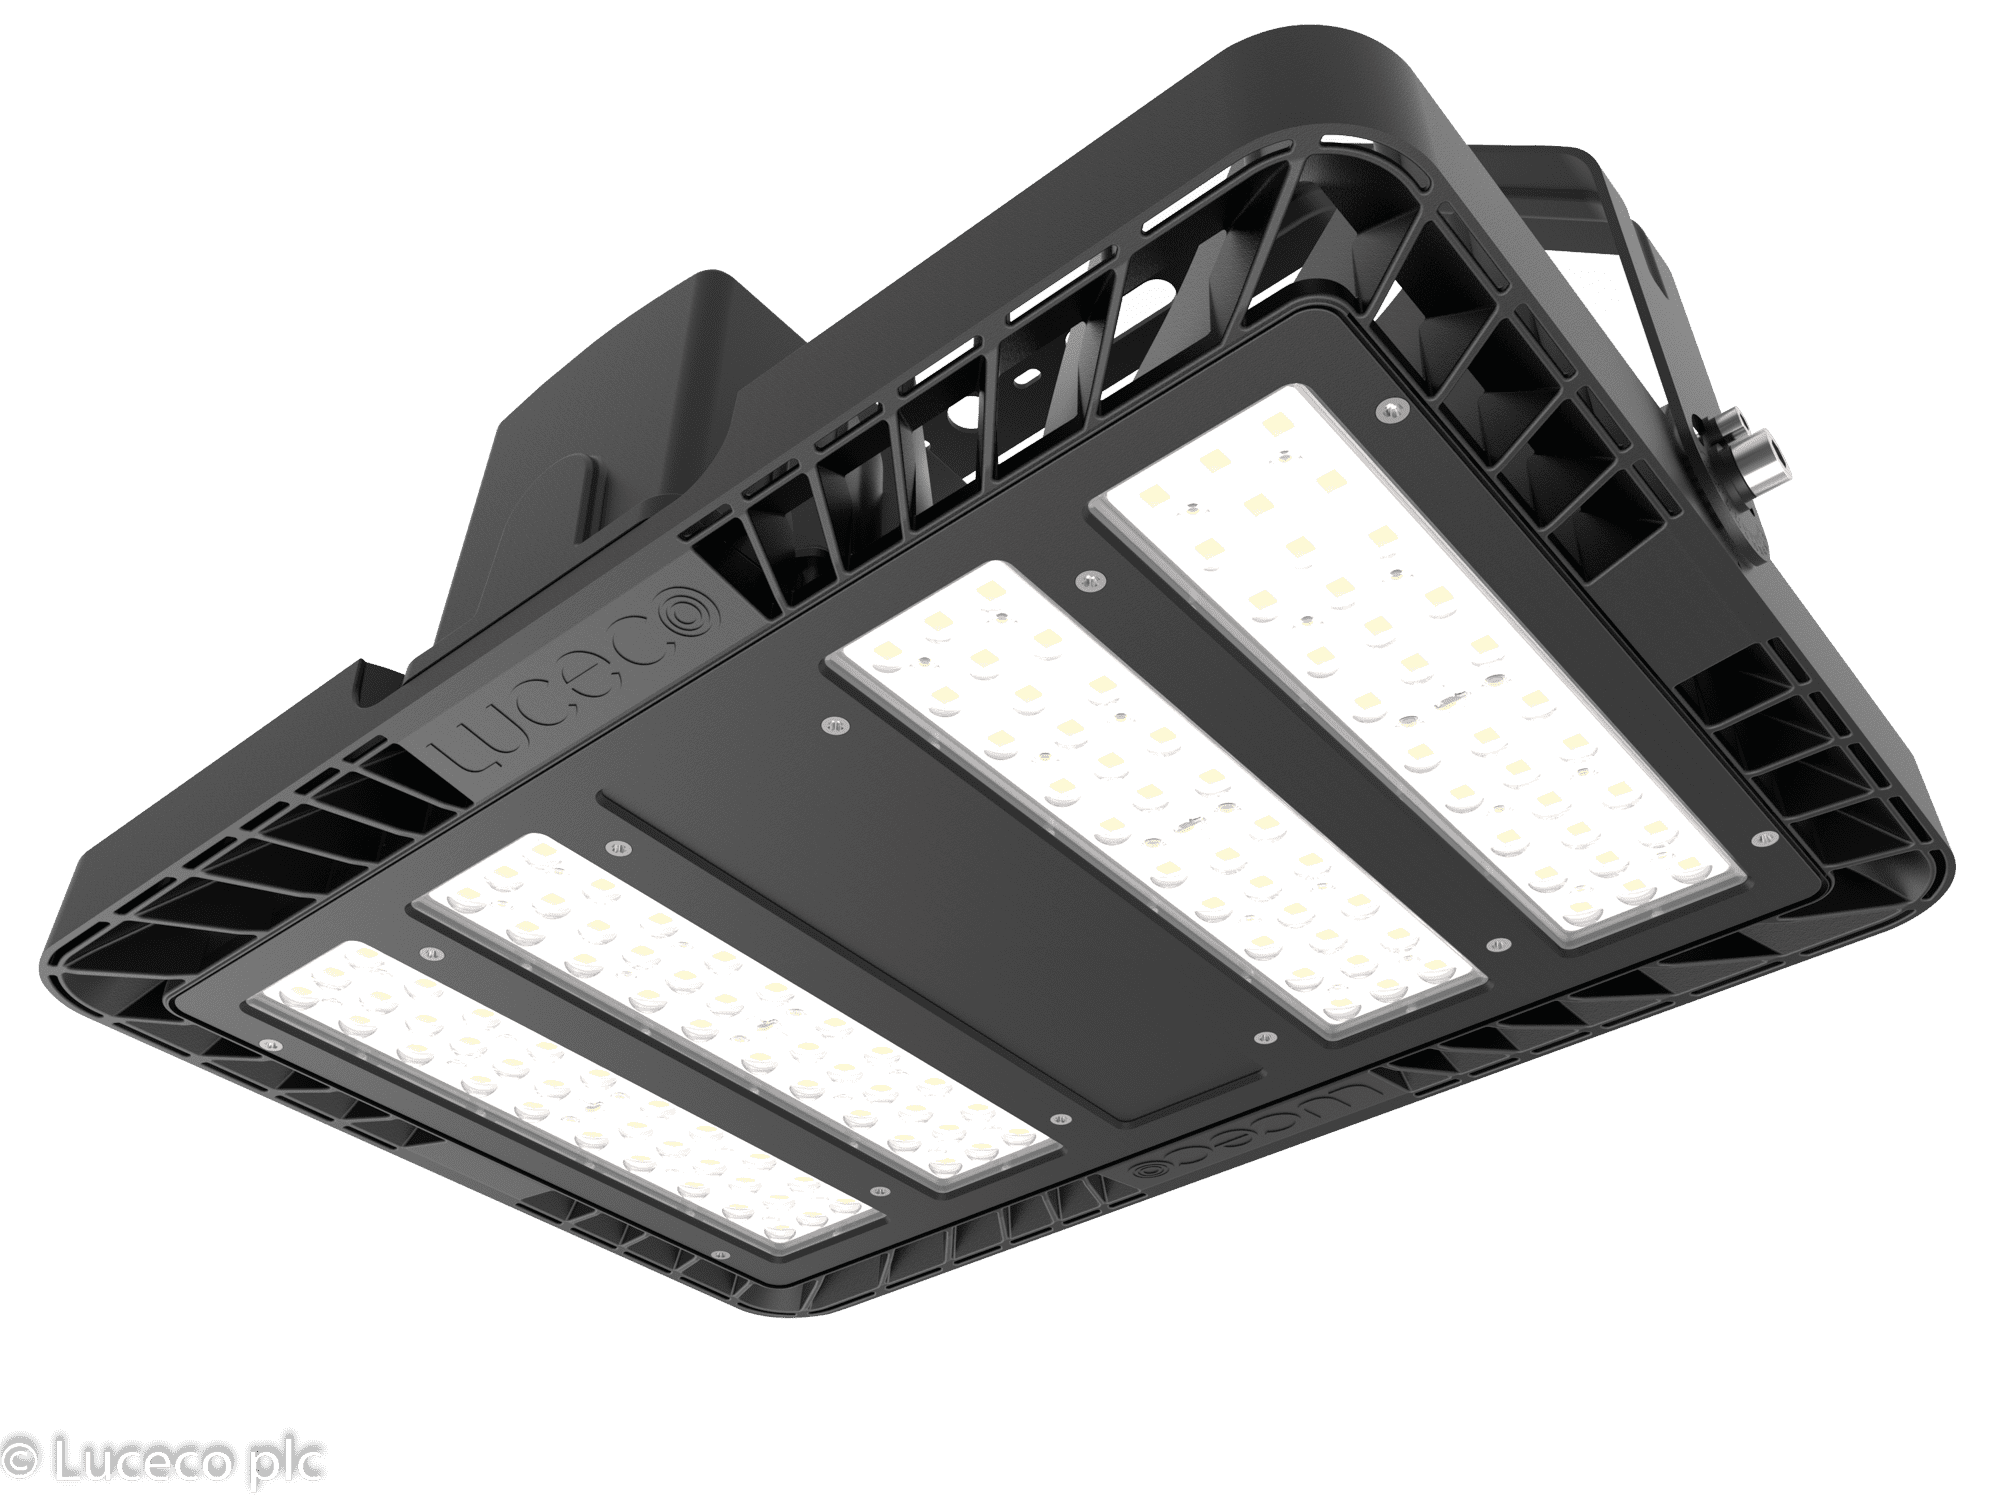 Luceco LED Hallentiefstrahler 190W 120° 22000Lm 4000K IP65 #LHBC22S120-02